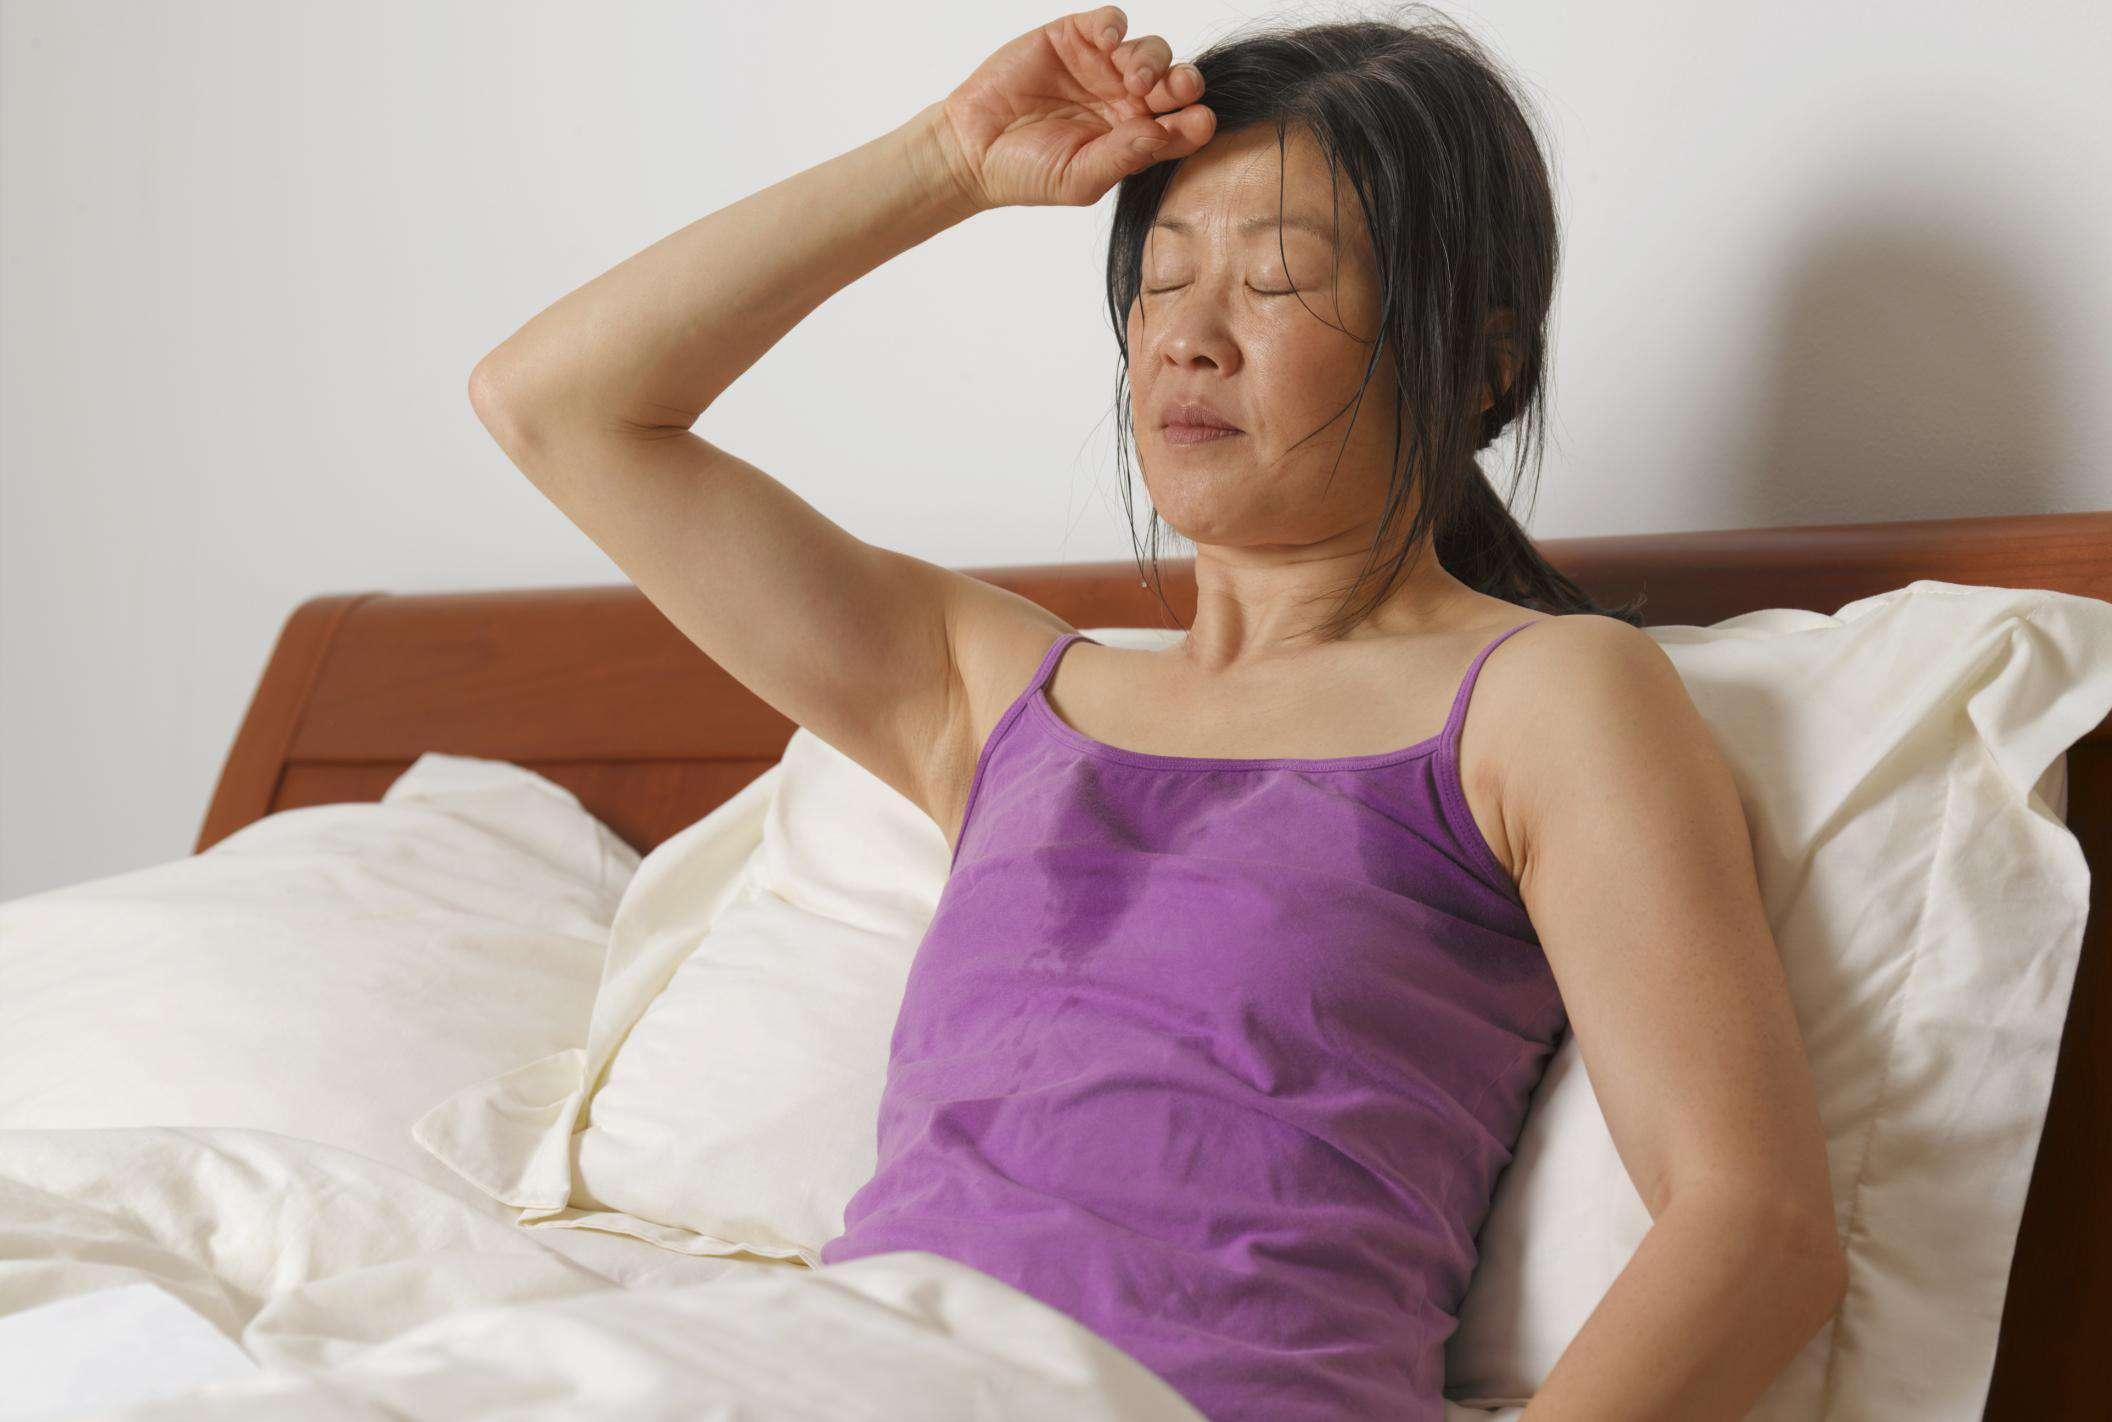 Woman Experiencing Menopause Suymptoms